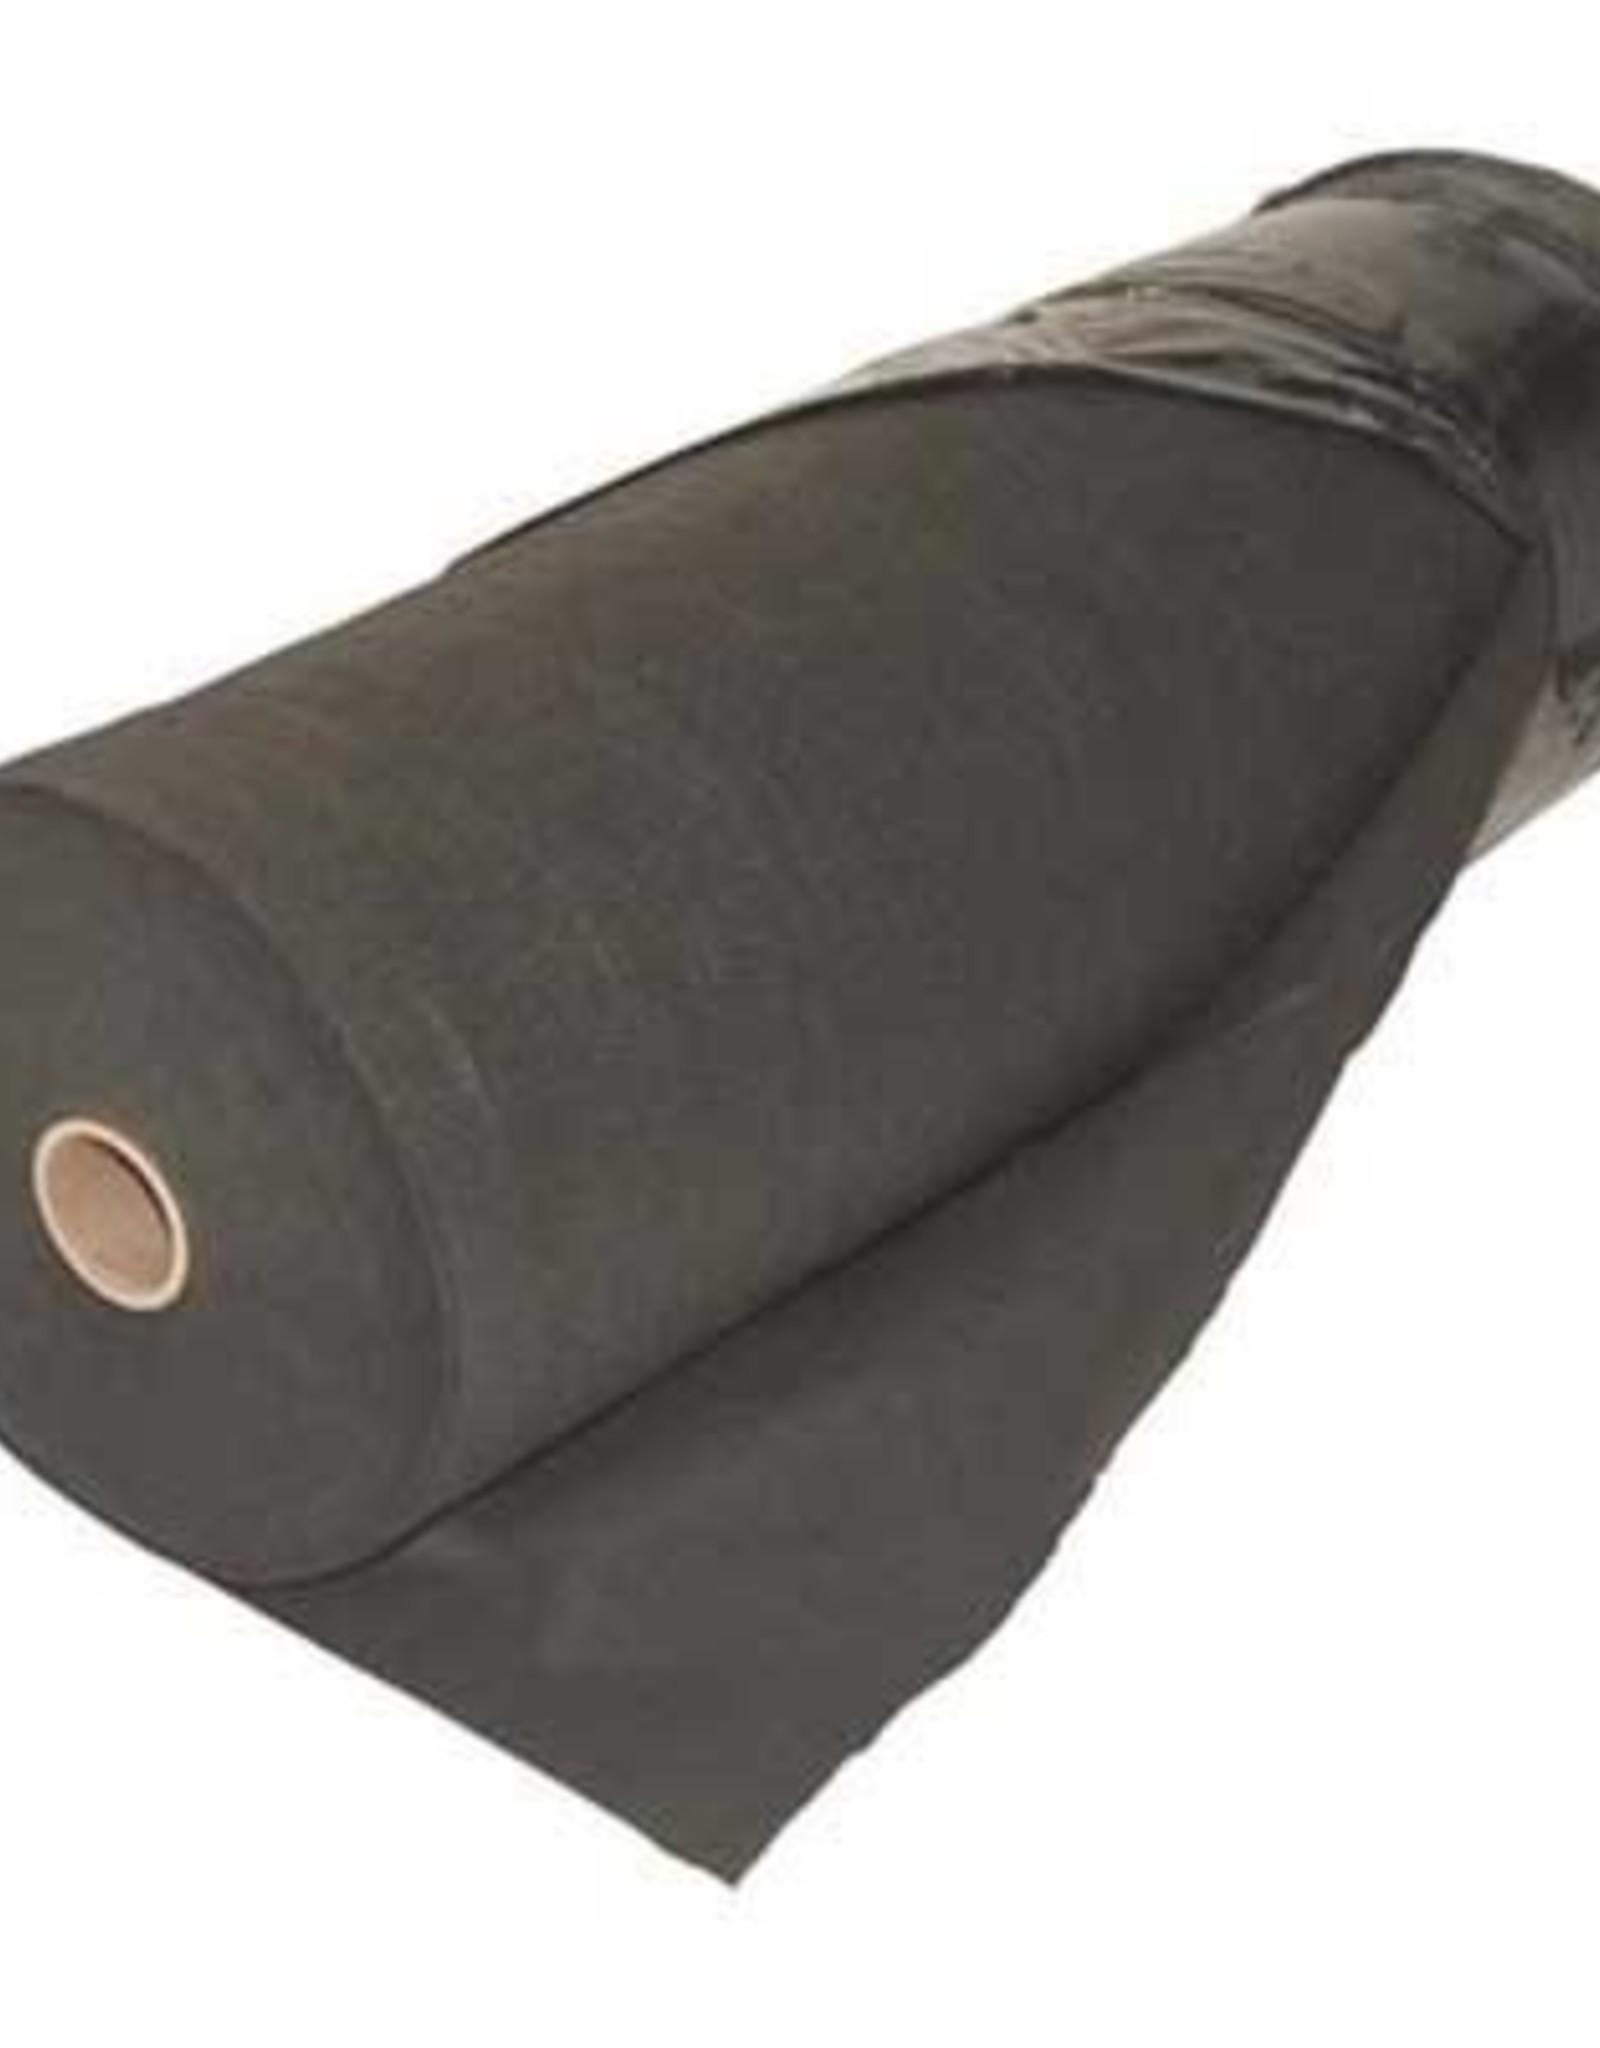 Non-Woven Geotextile Fabric LM 1000 NT 10 oz. SZ. 12.5' x 360'